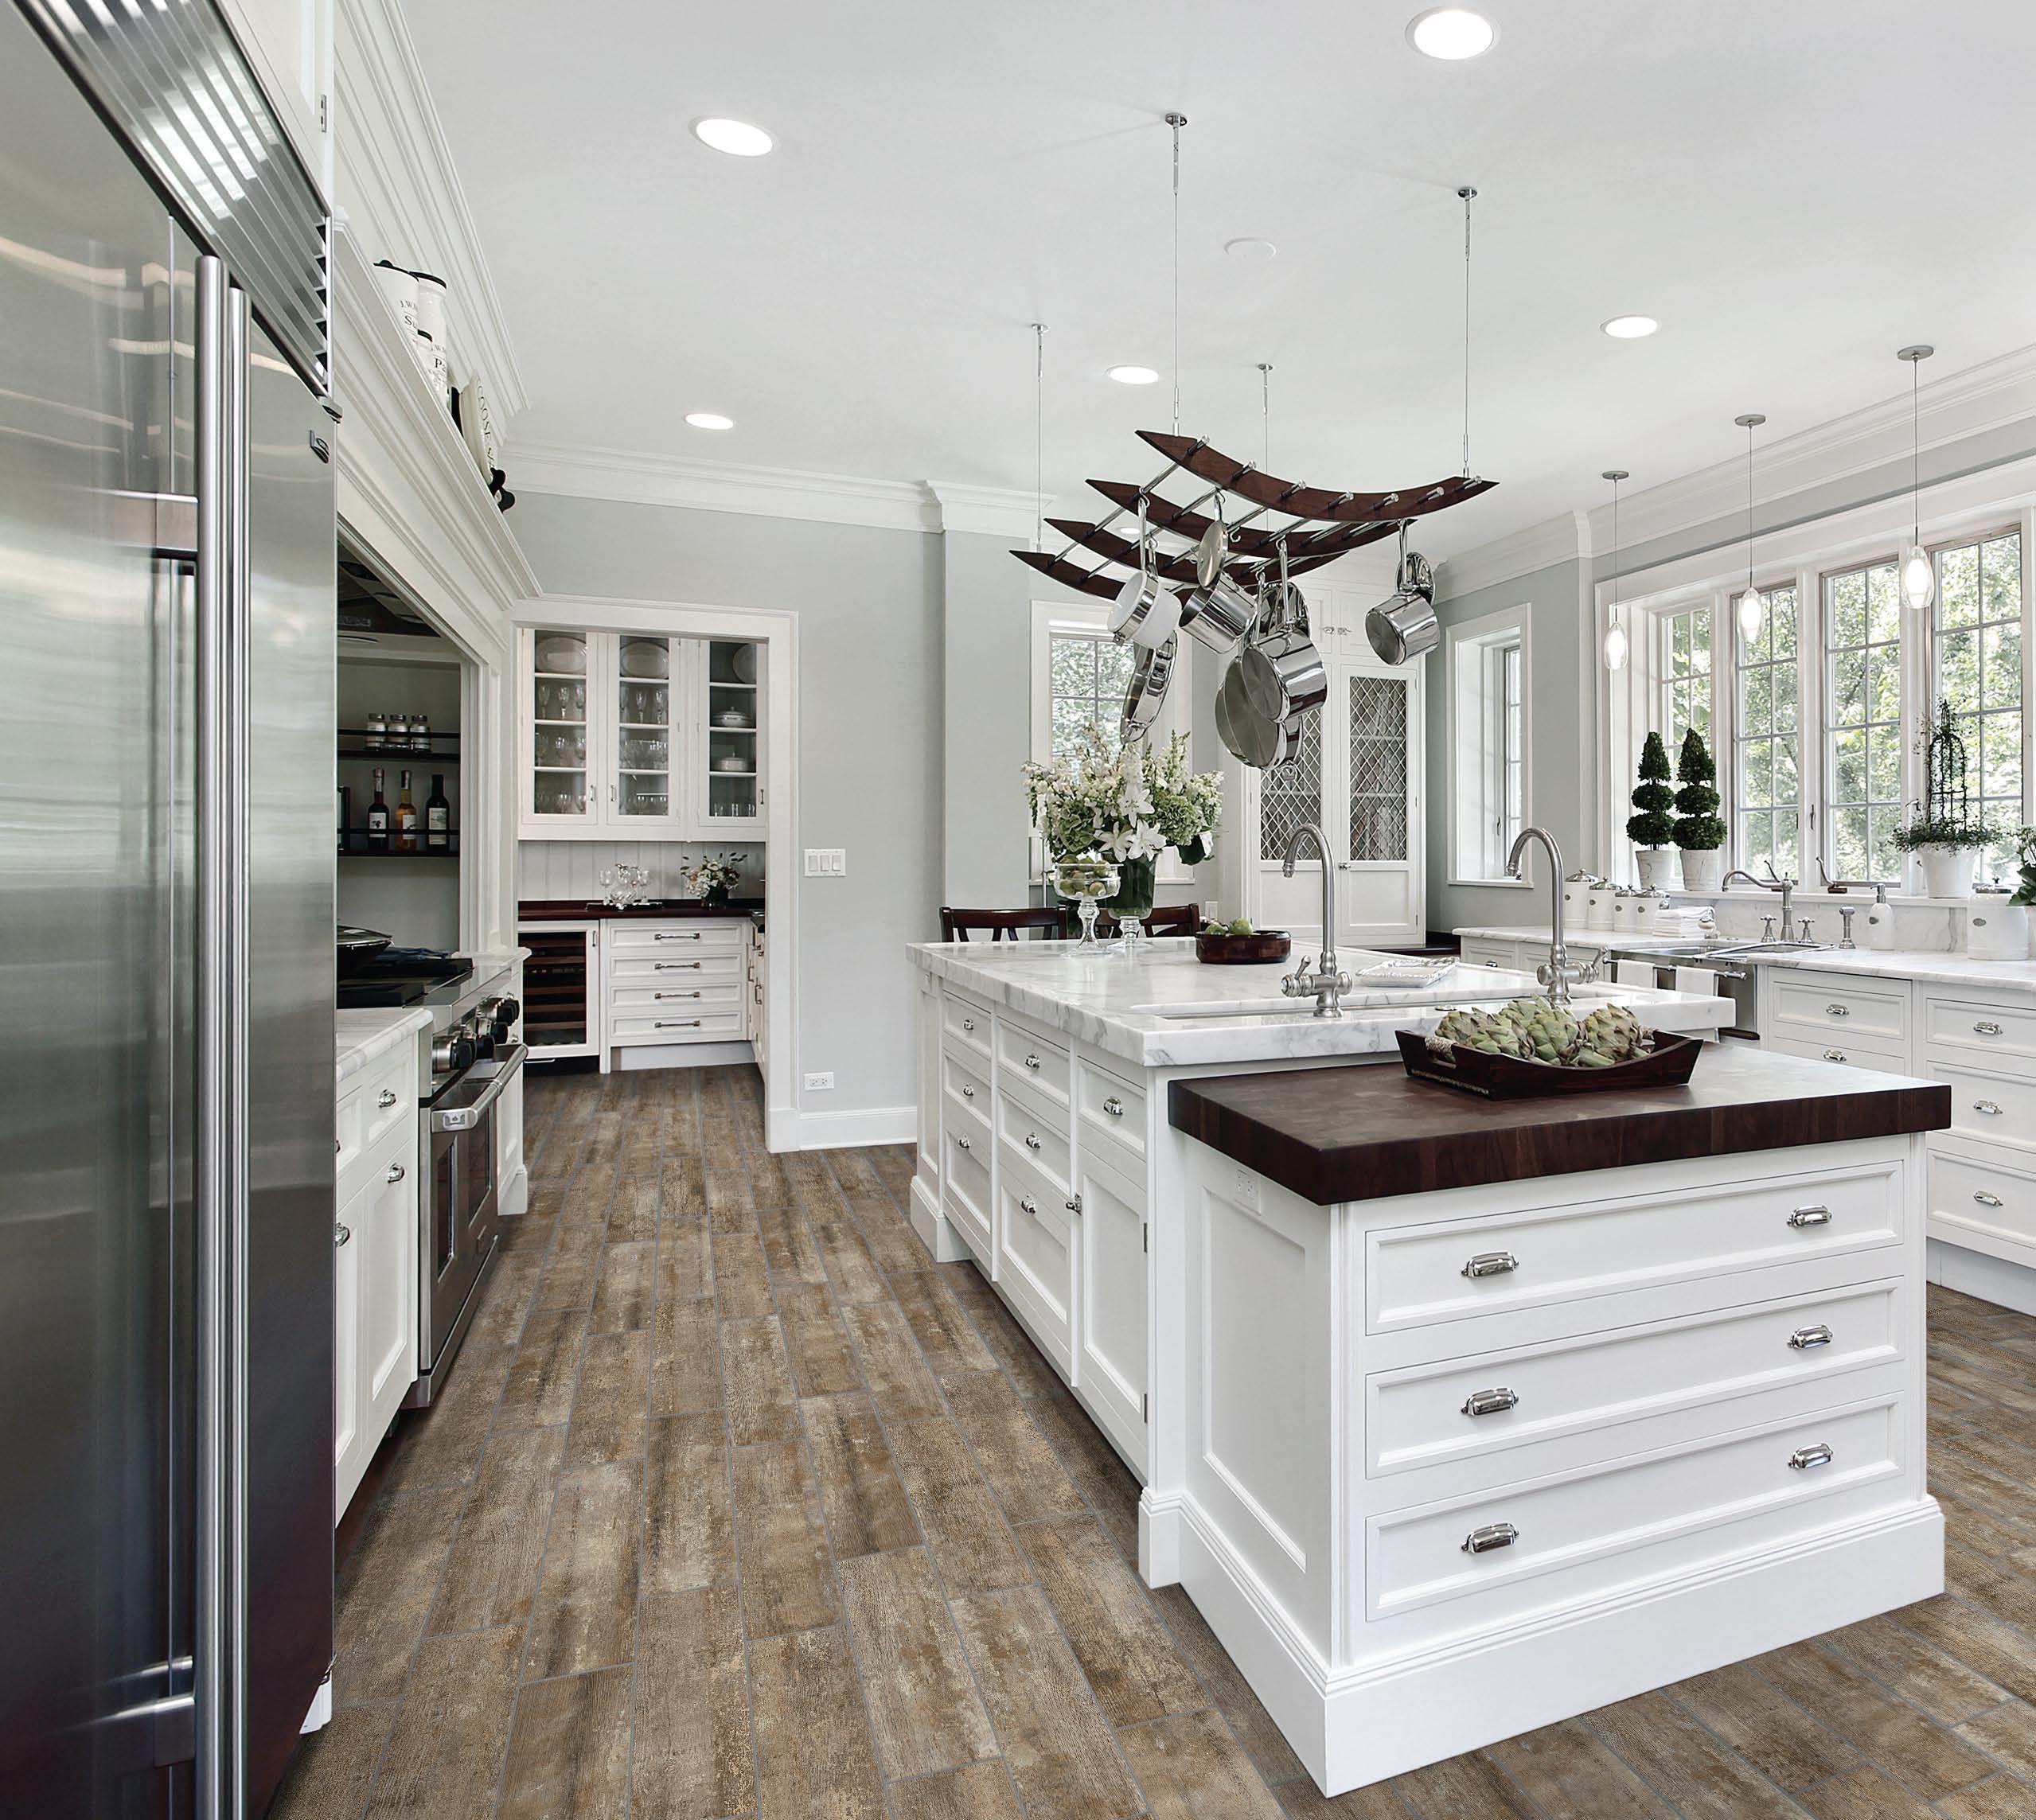 anatolia modern farmhouse kitchen what a beautiful rustic